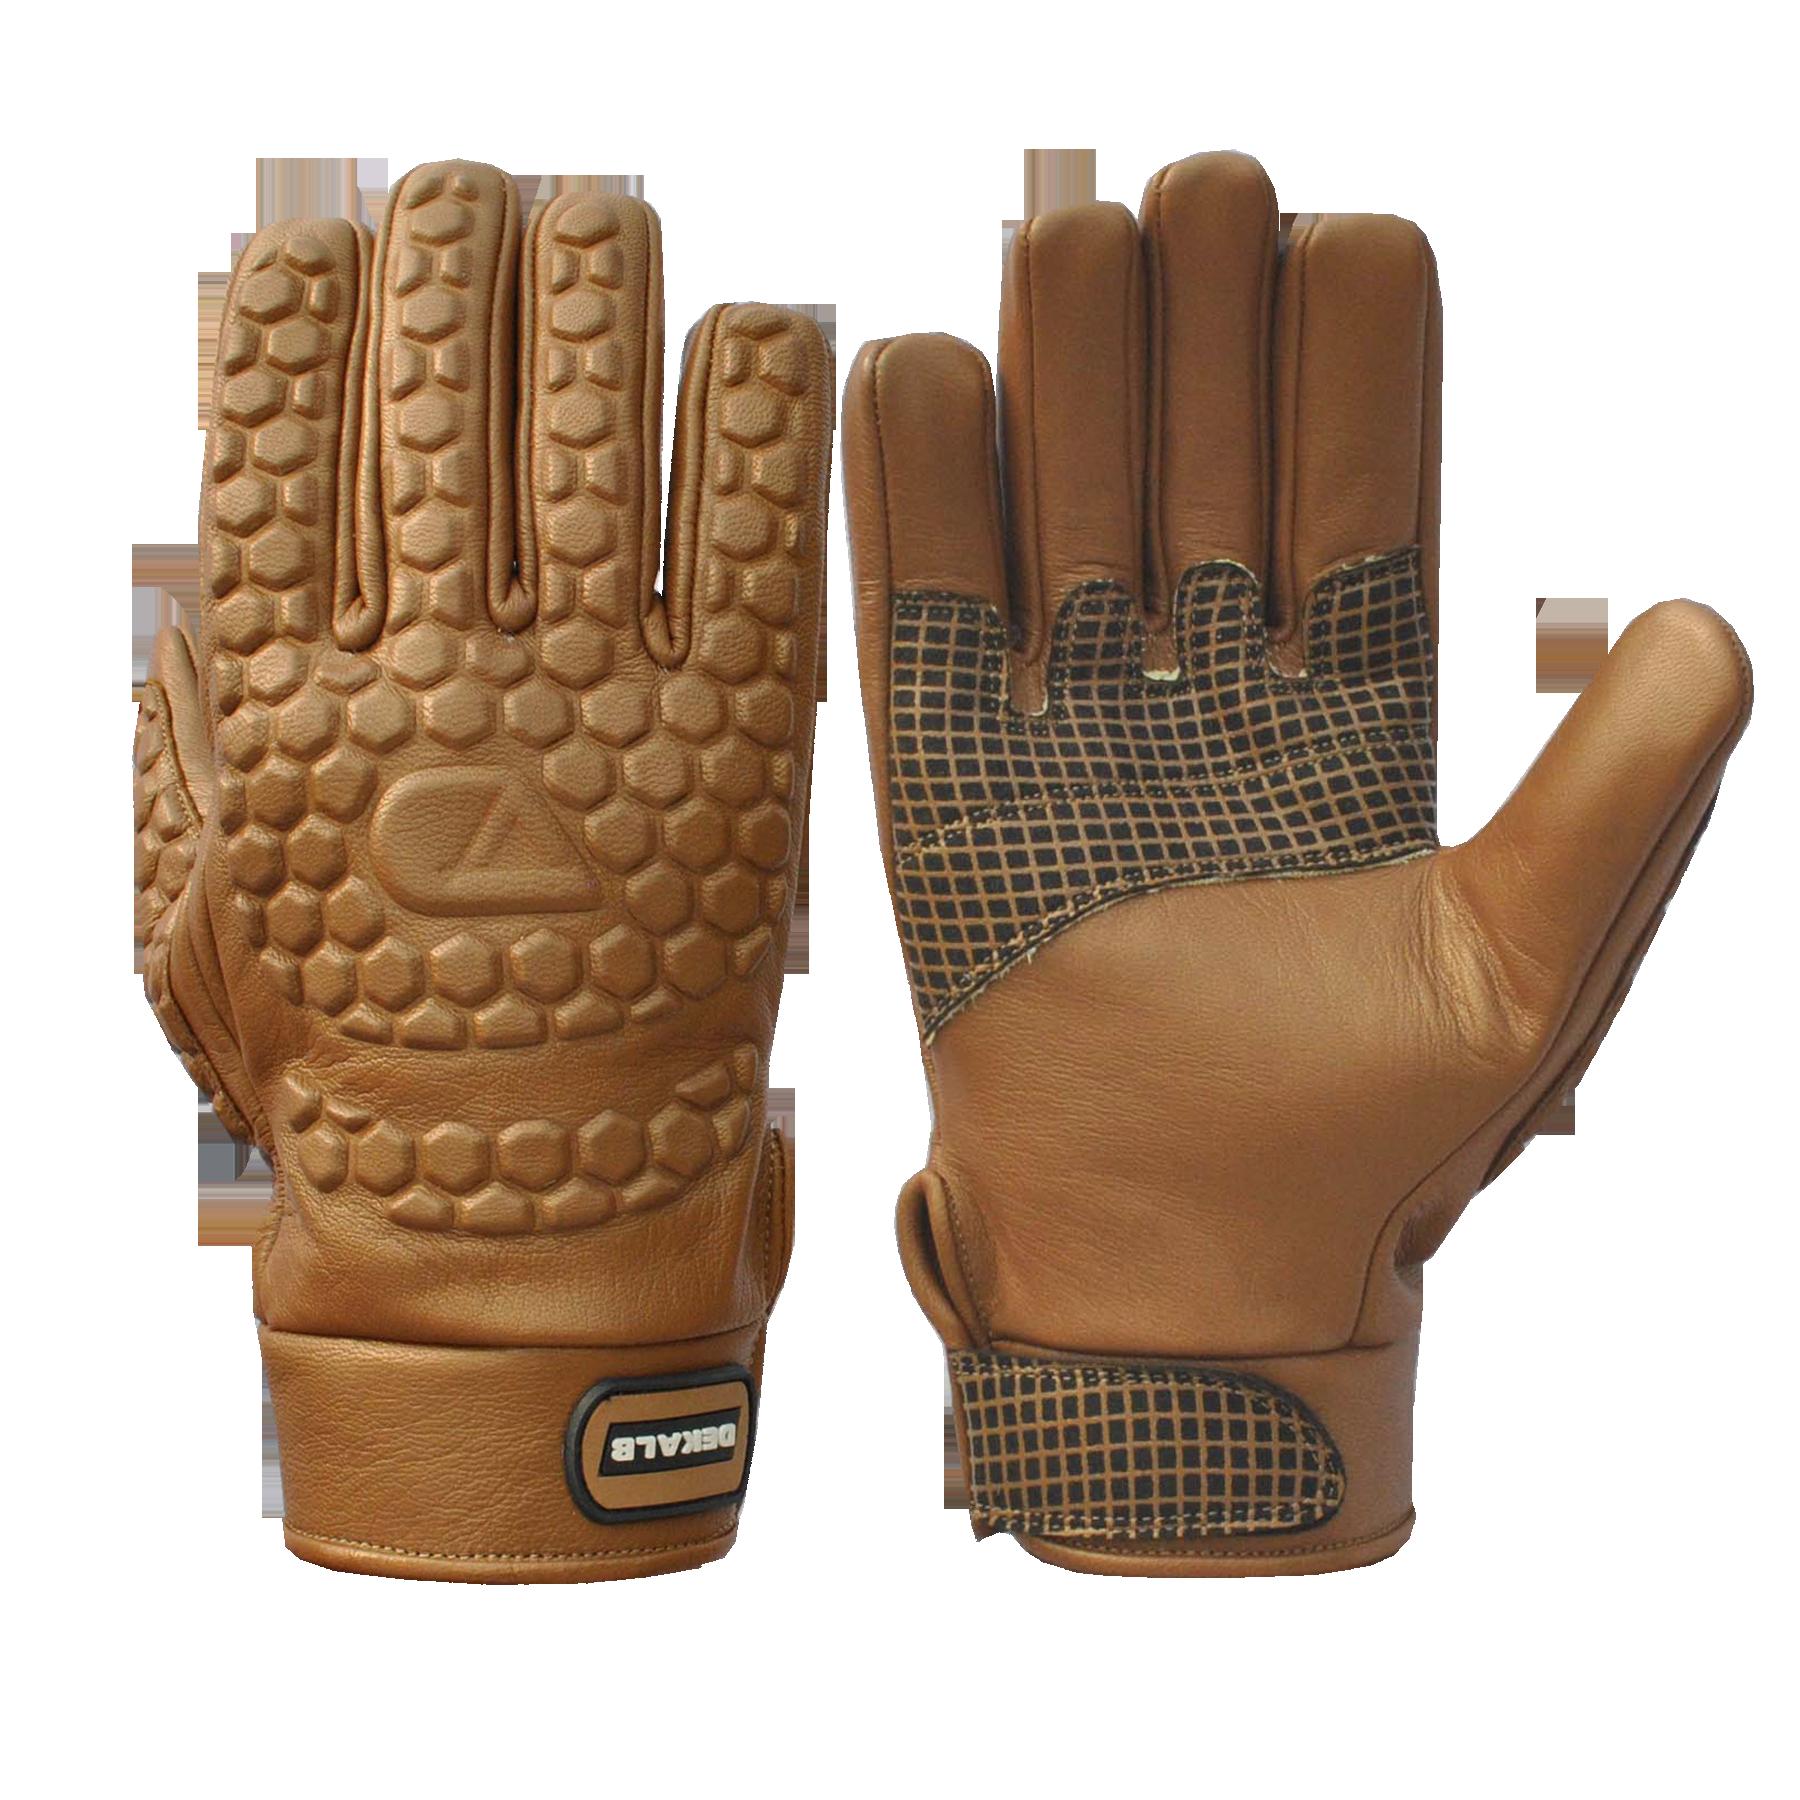 Mittens clipart ski glove. Blade cut resistant abrasion